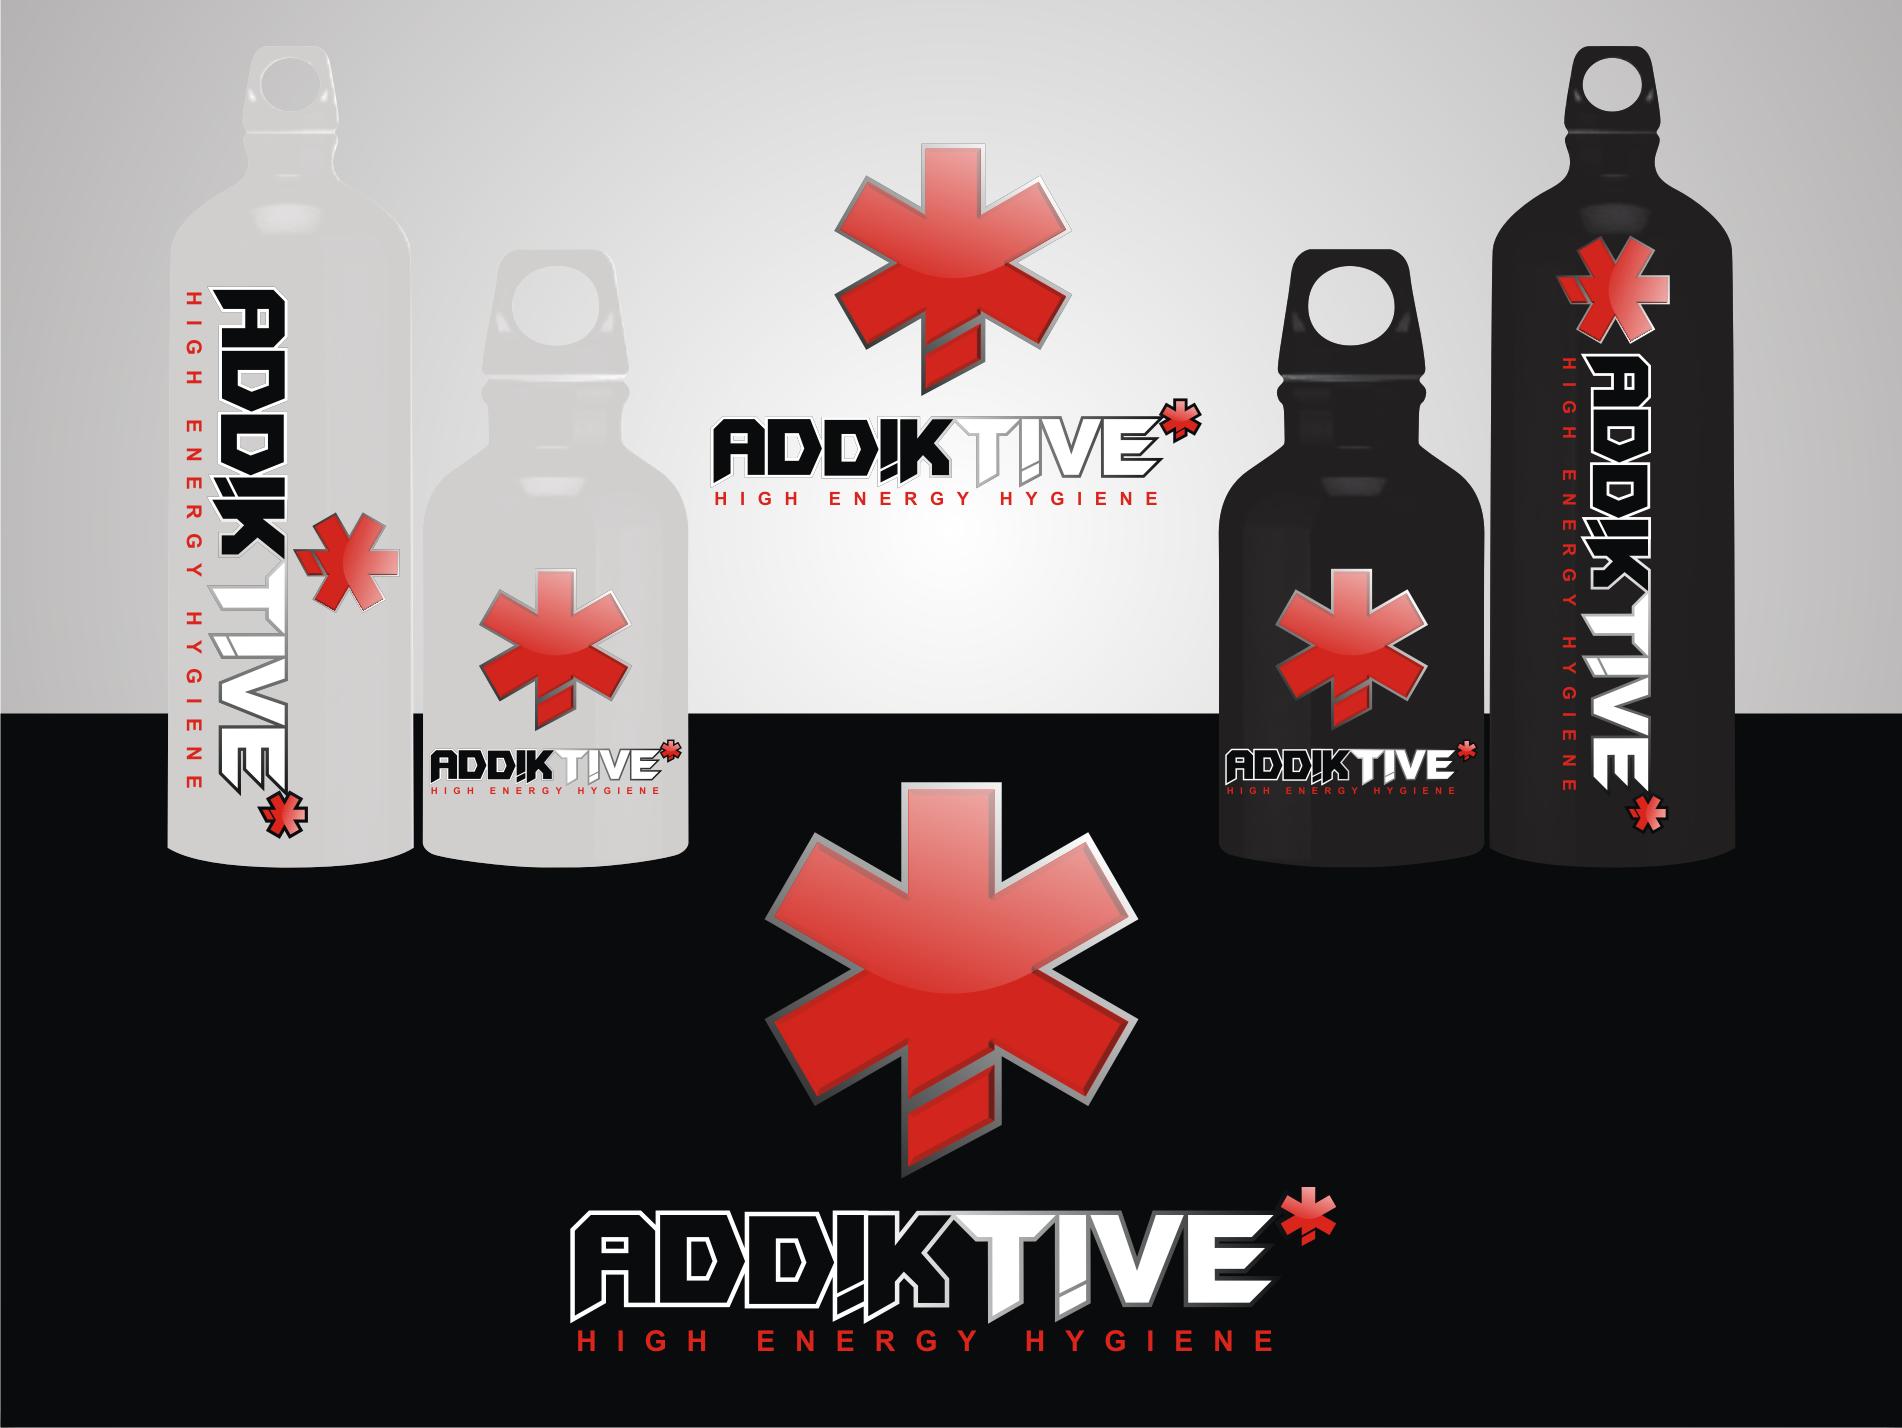 Help ADDIKTIVE with a new logo